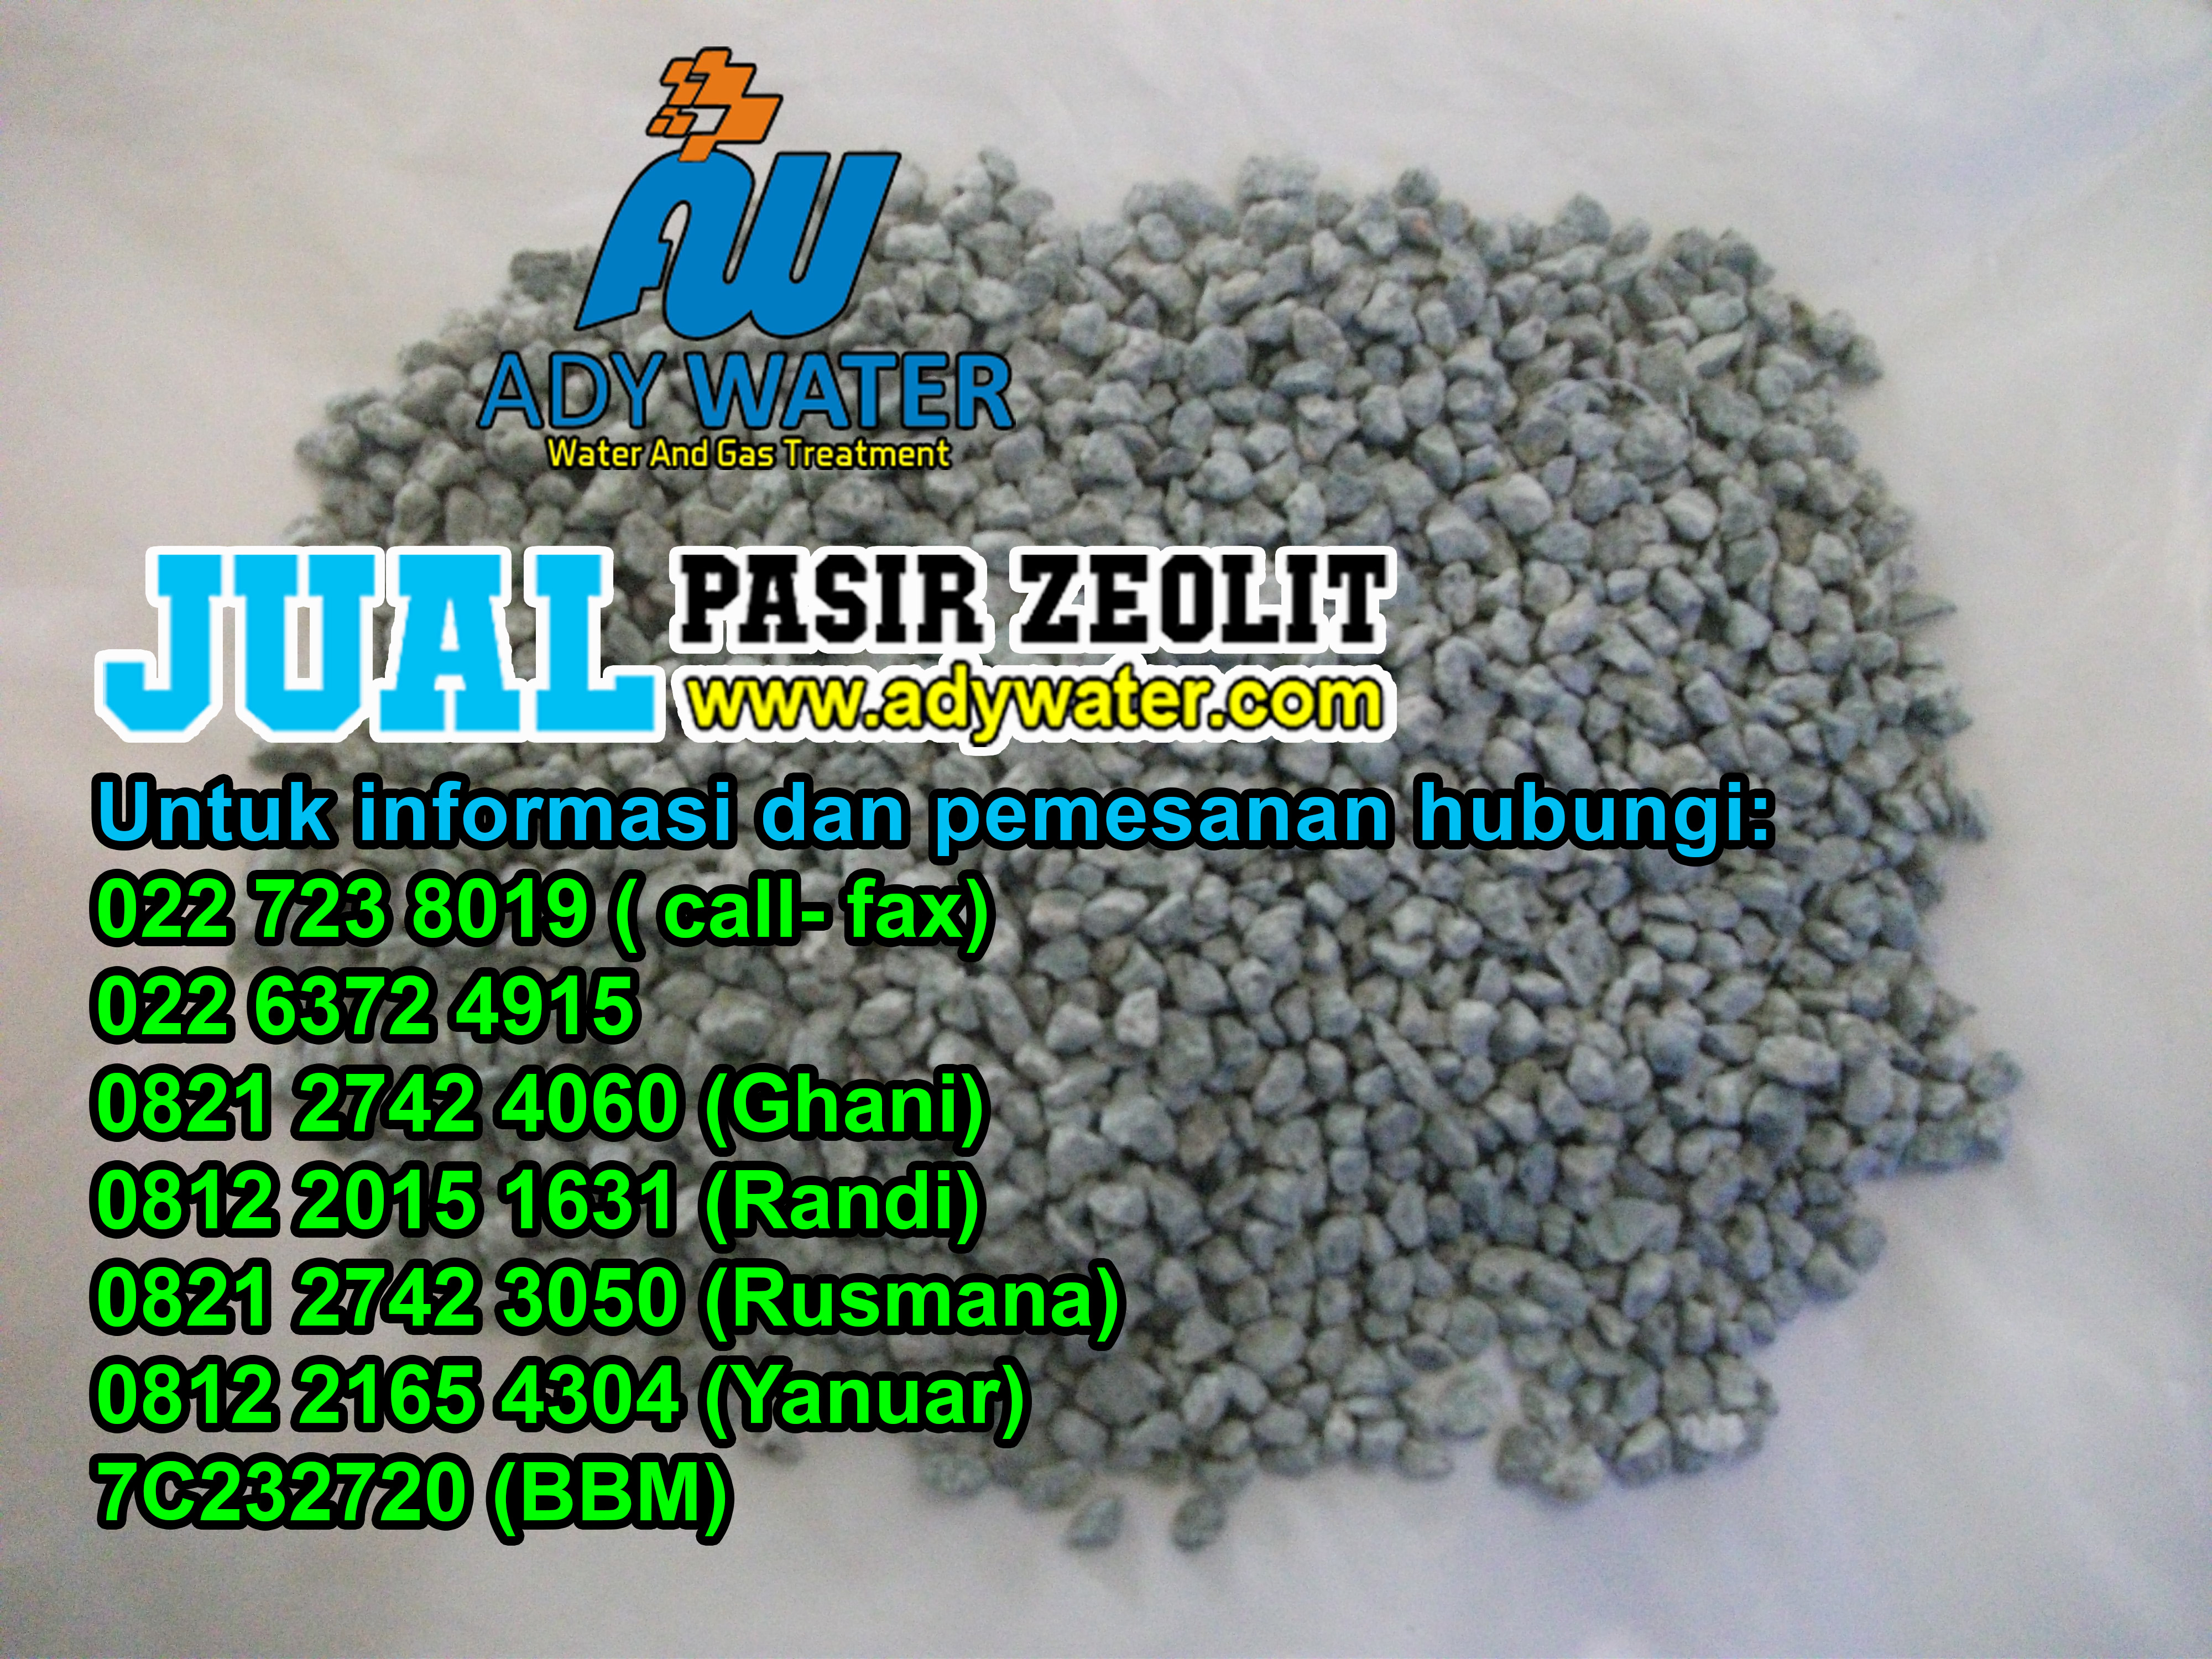 ZEOLITE POWDER INDONESIA | 0821 2742 4060 | 0812 2015 1631 | TOKO ZEOLITE POWDER INDONESIA | ADY WATER